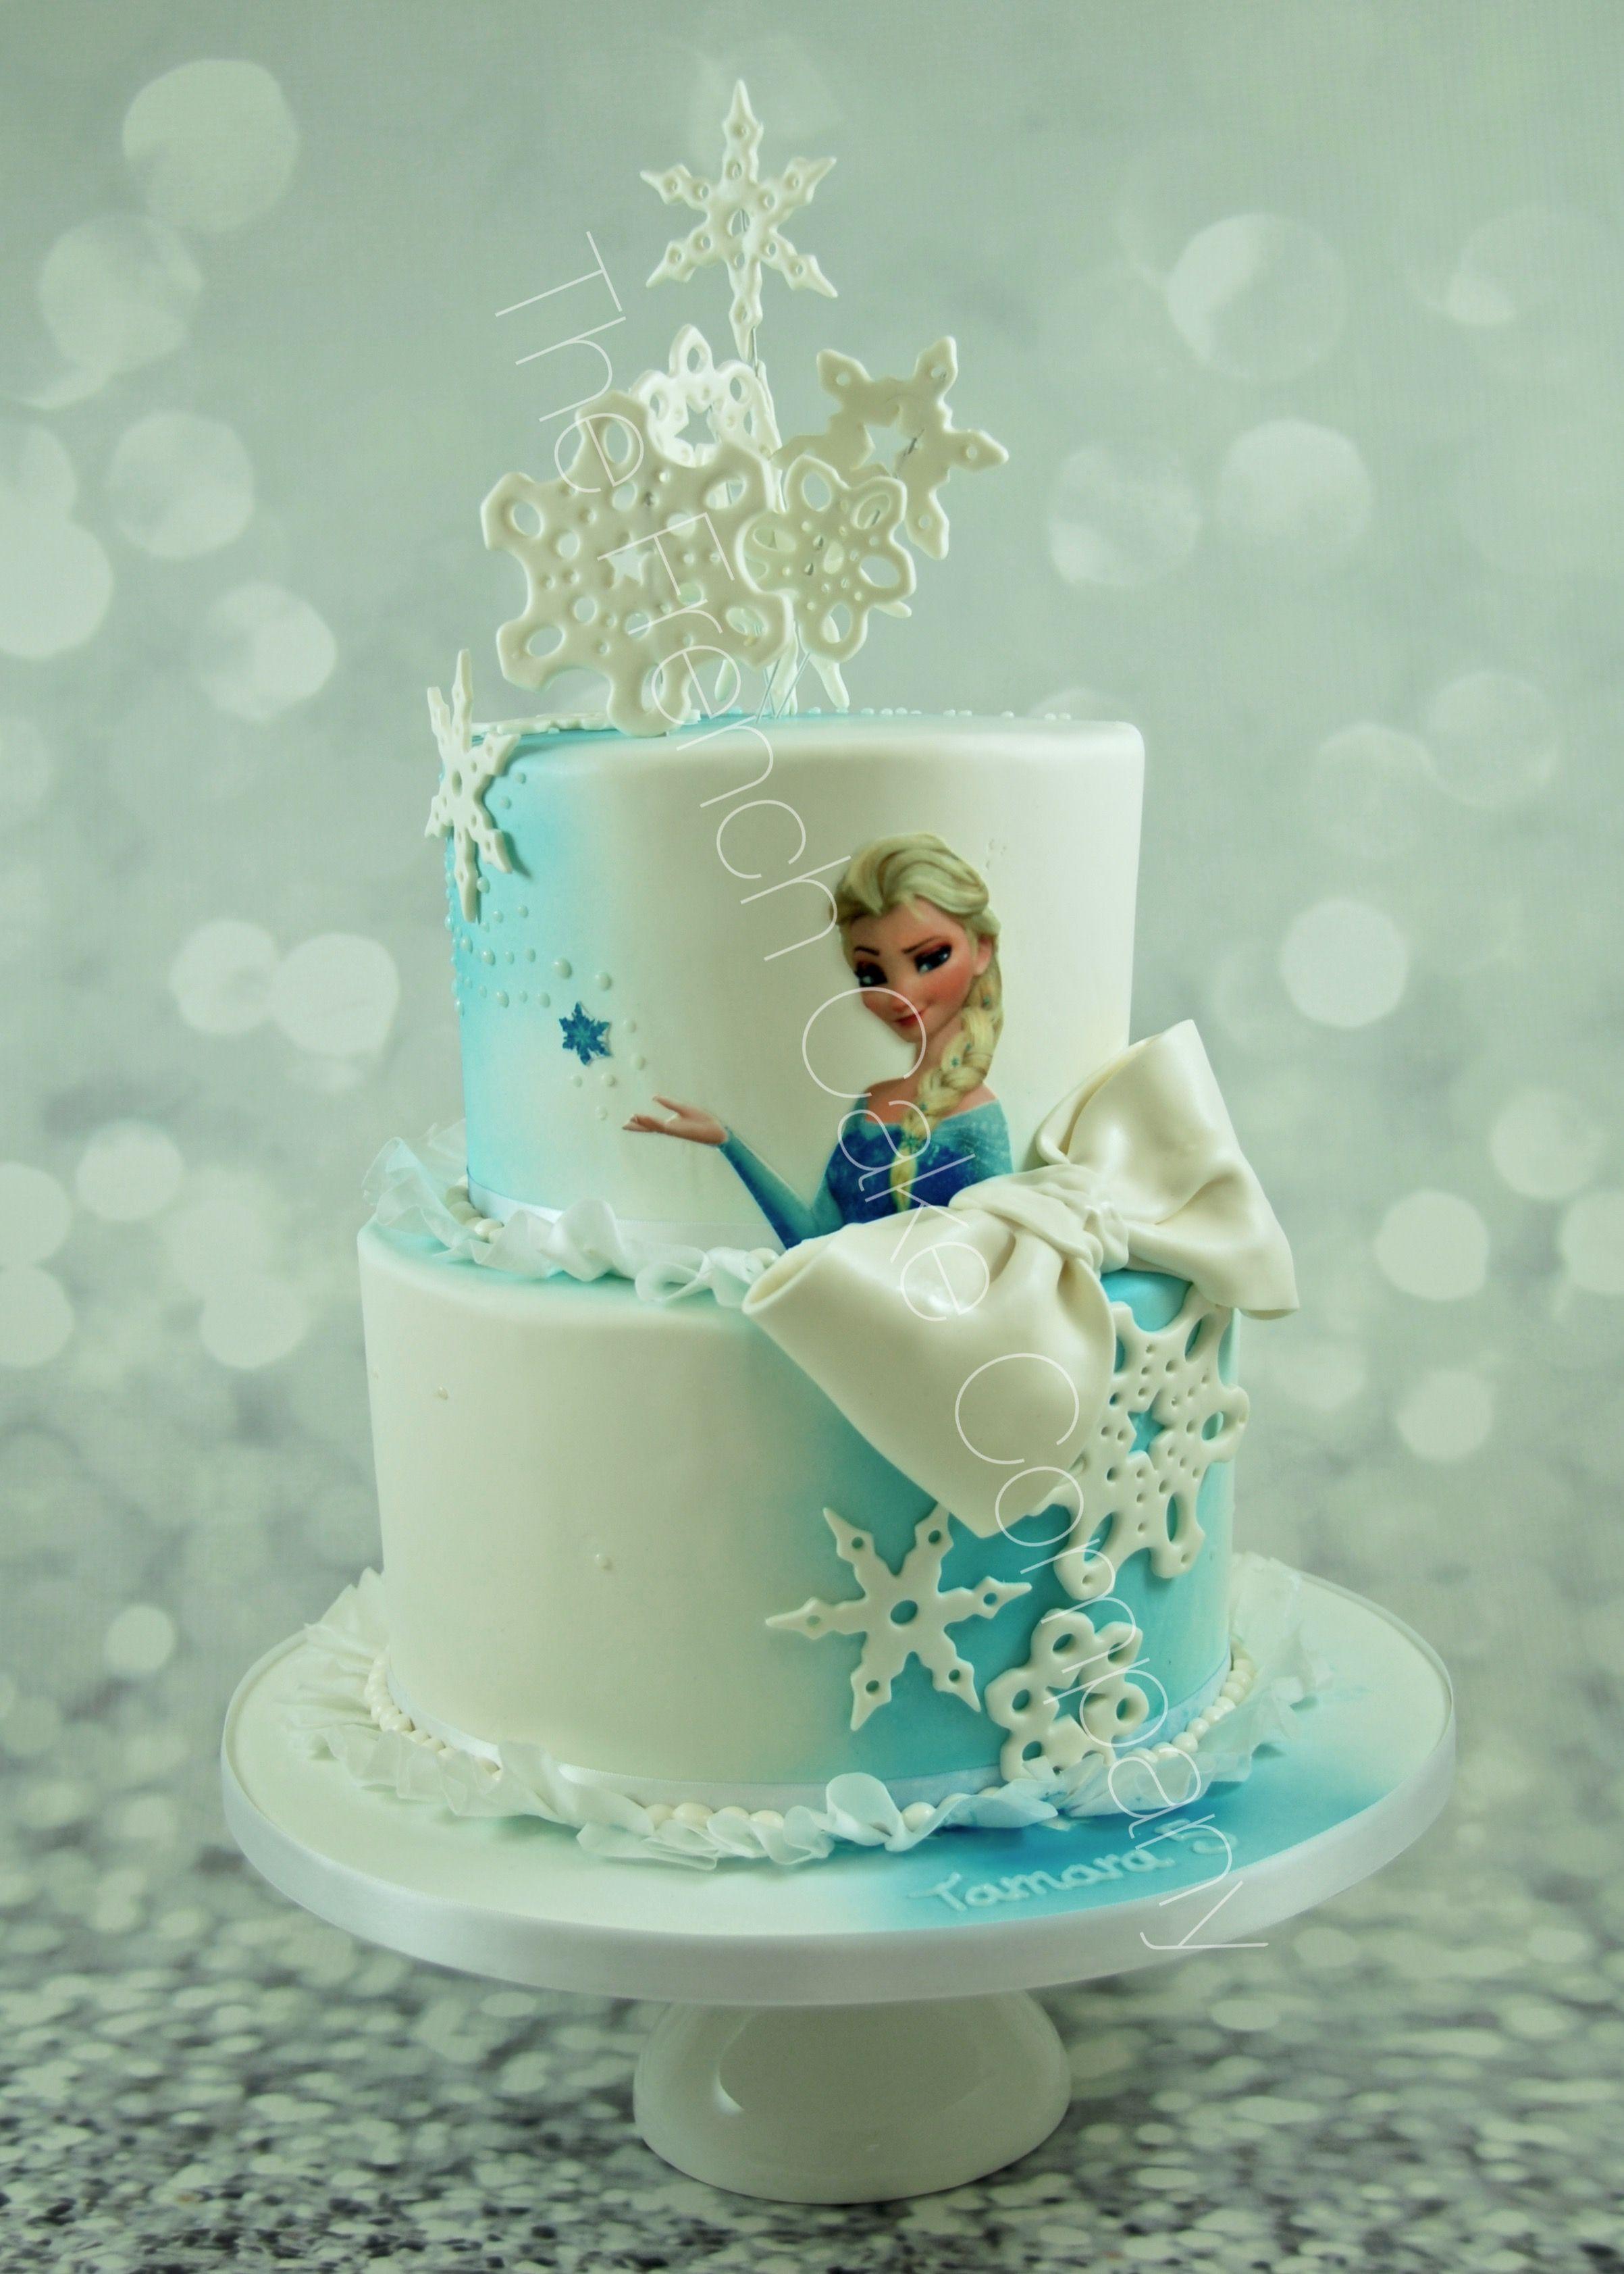 Frozen cake design images  Pièce montée Reine des Neiges Elsa Frozen Cake Cake Design Belgique